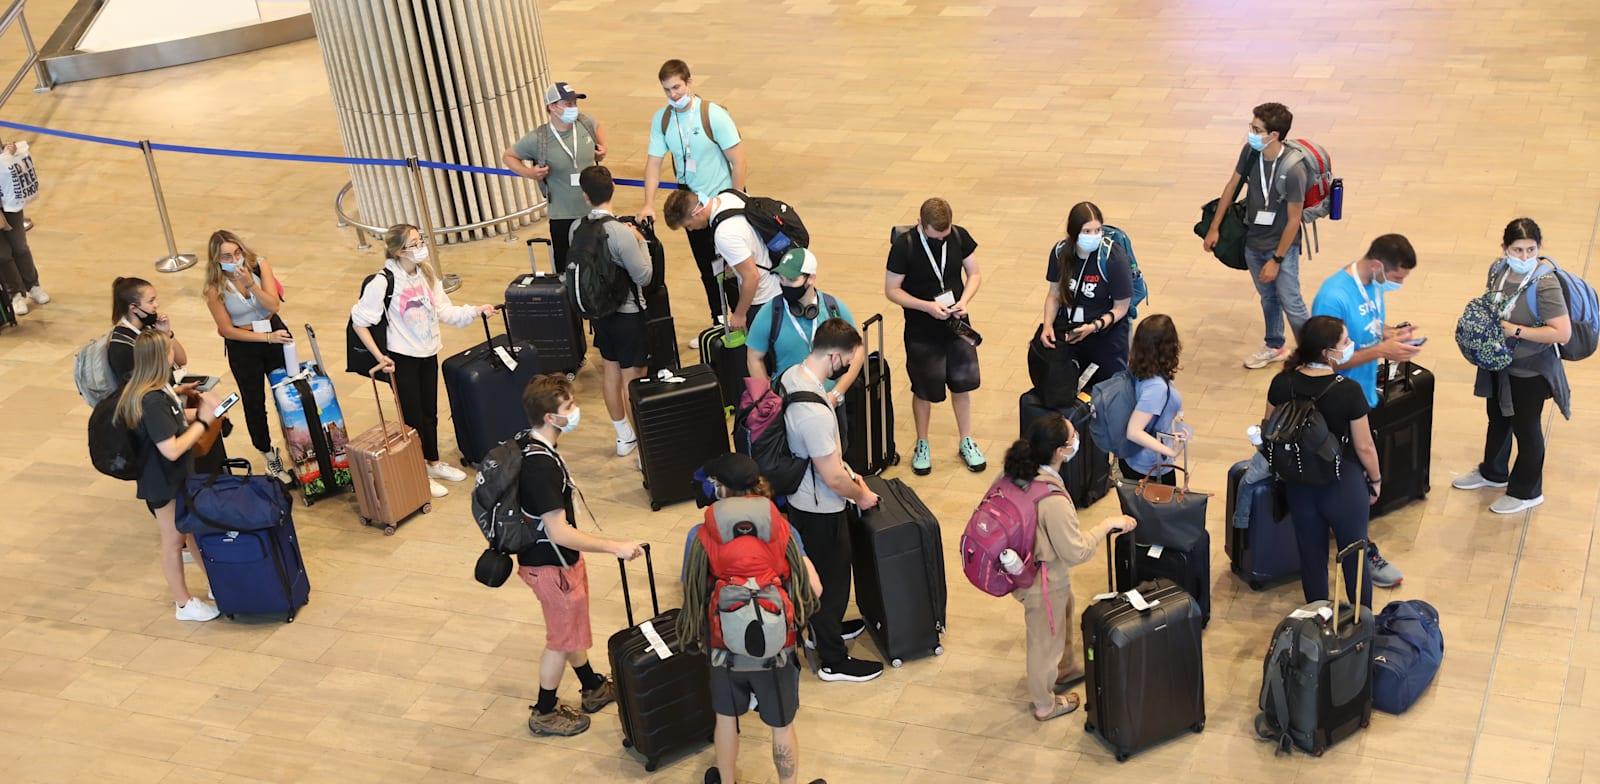 Ben Gurion airport arrivals Photo: Yossi Zamir